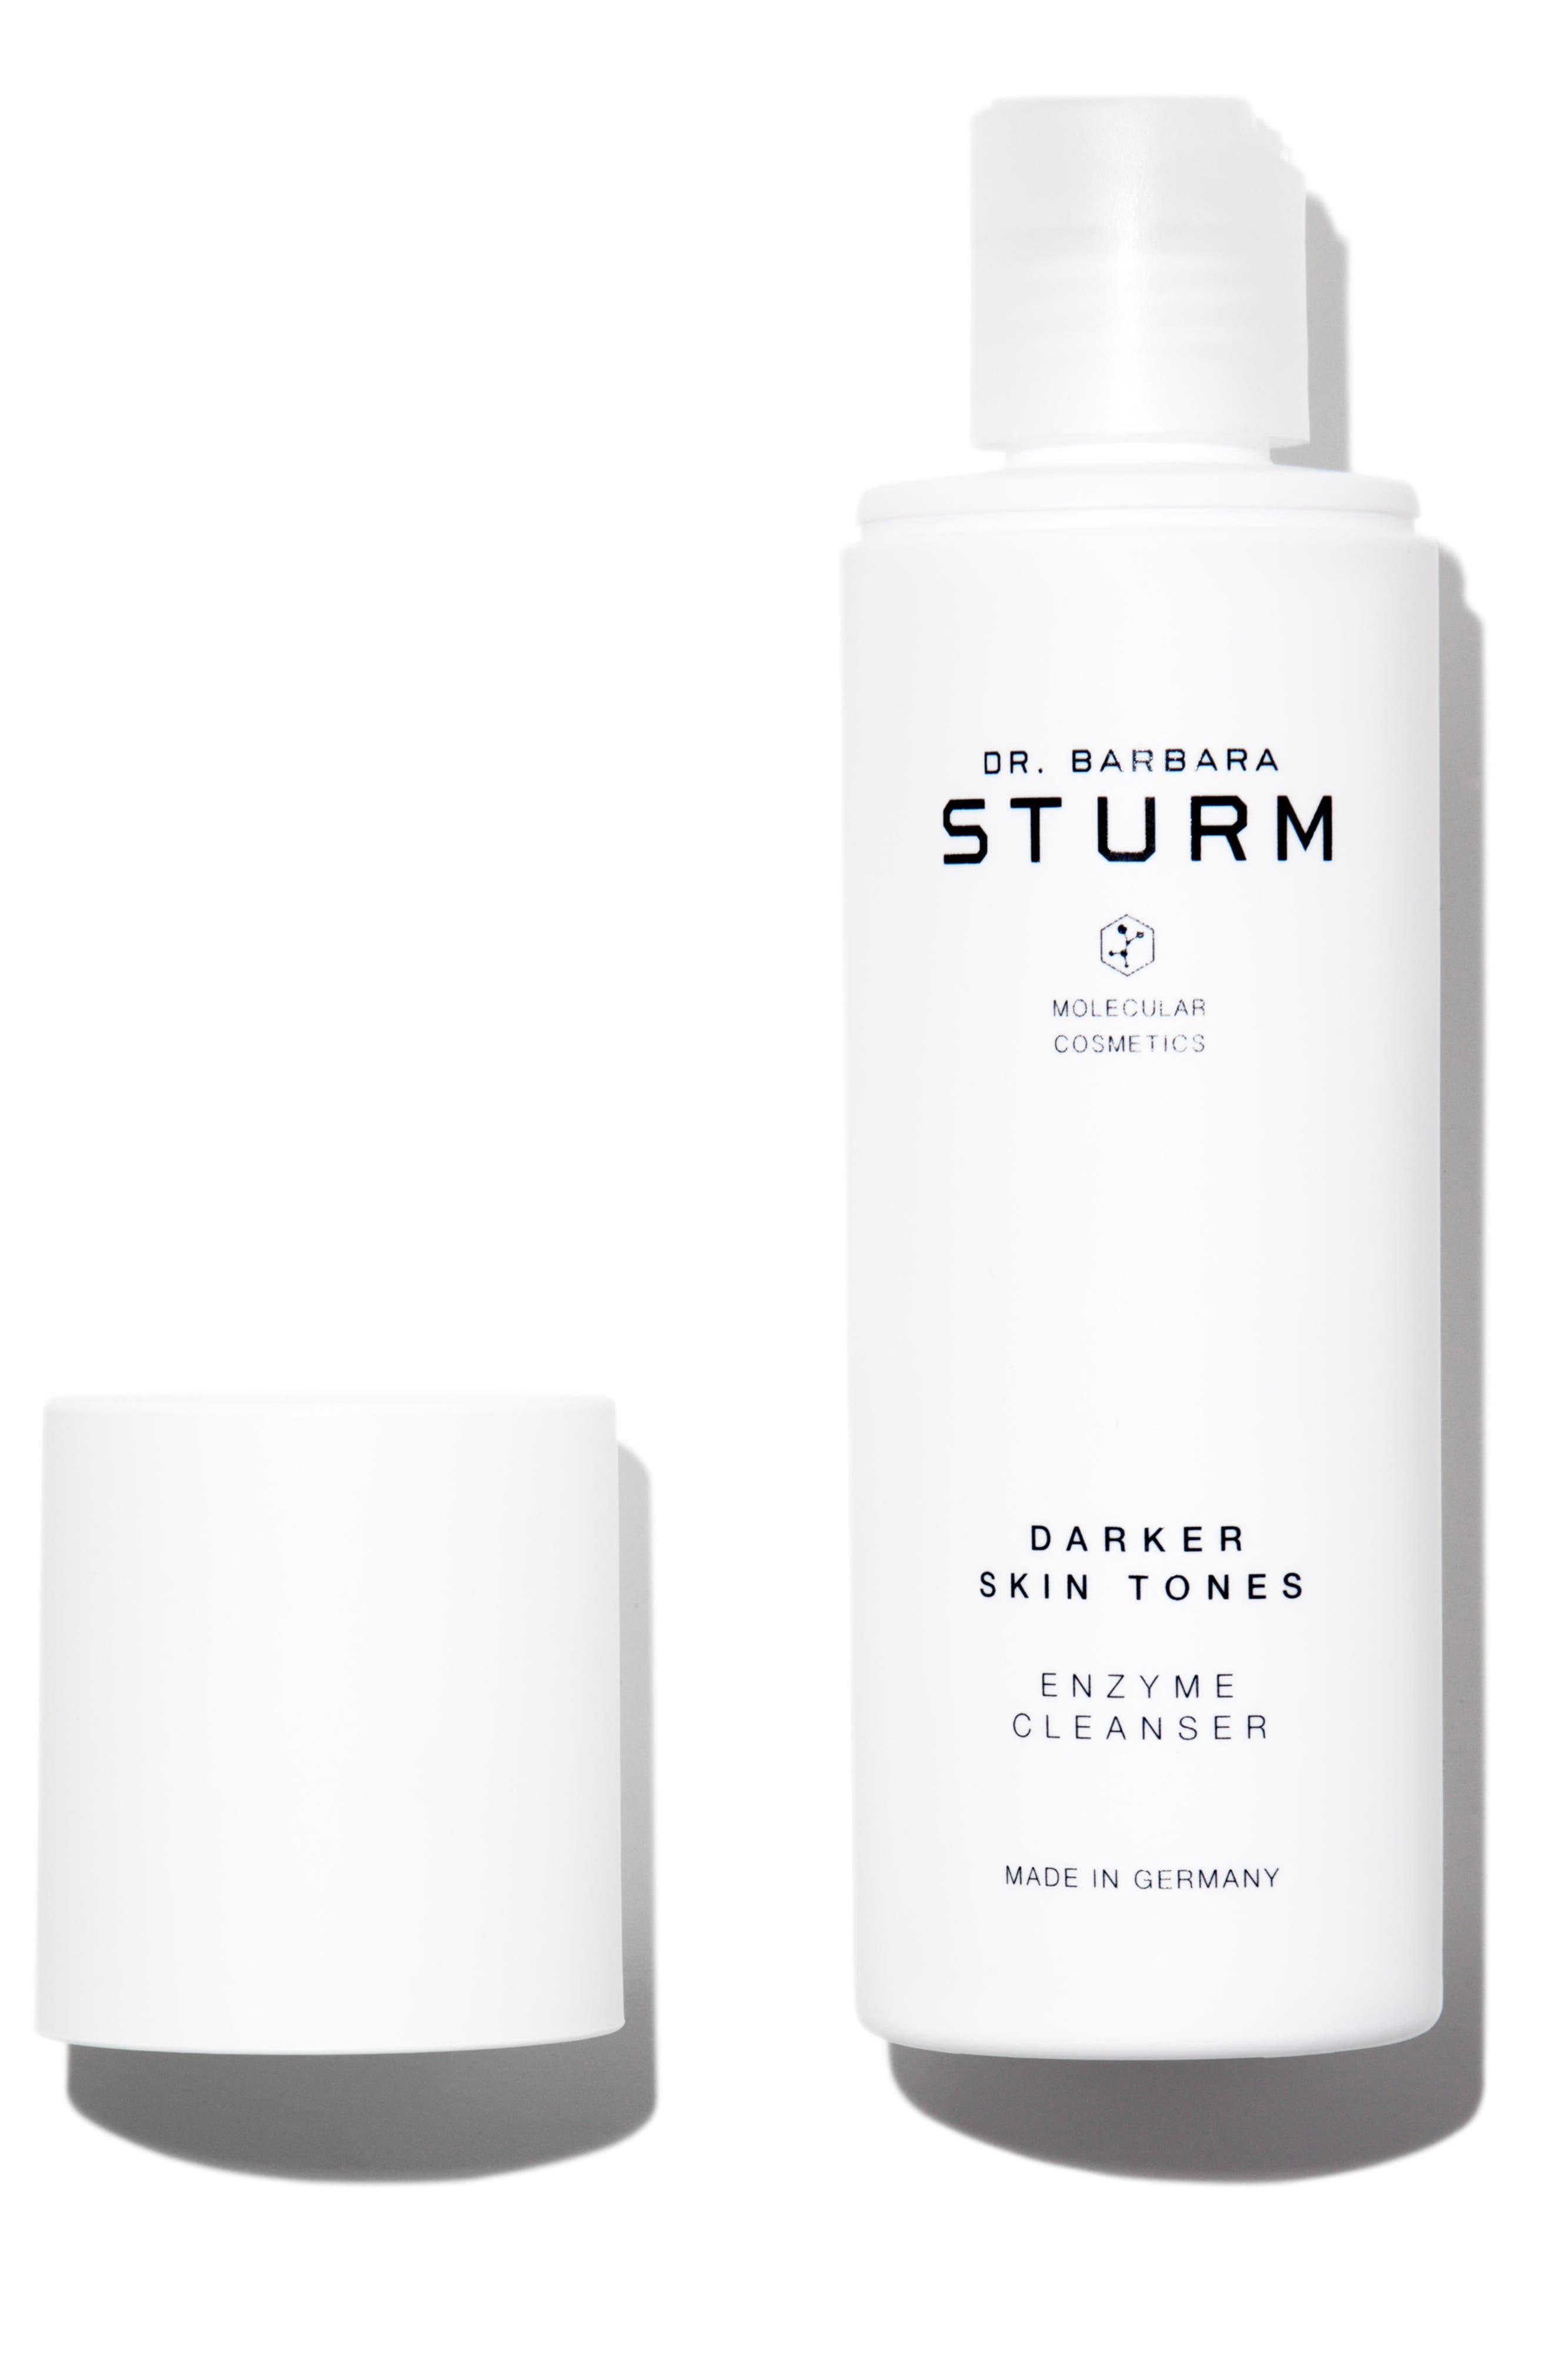 Dr. Barbara Sturm Darker Skin Tones Enzyme Cleanser